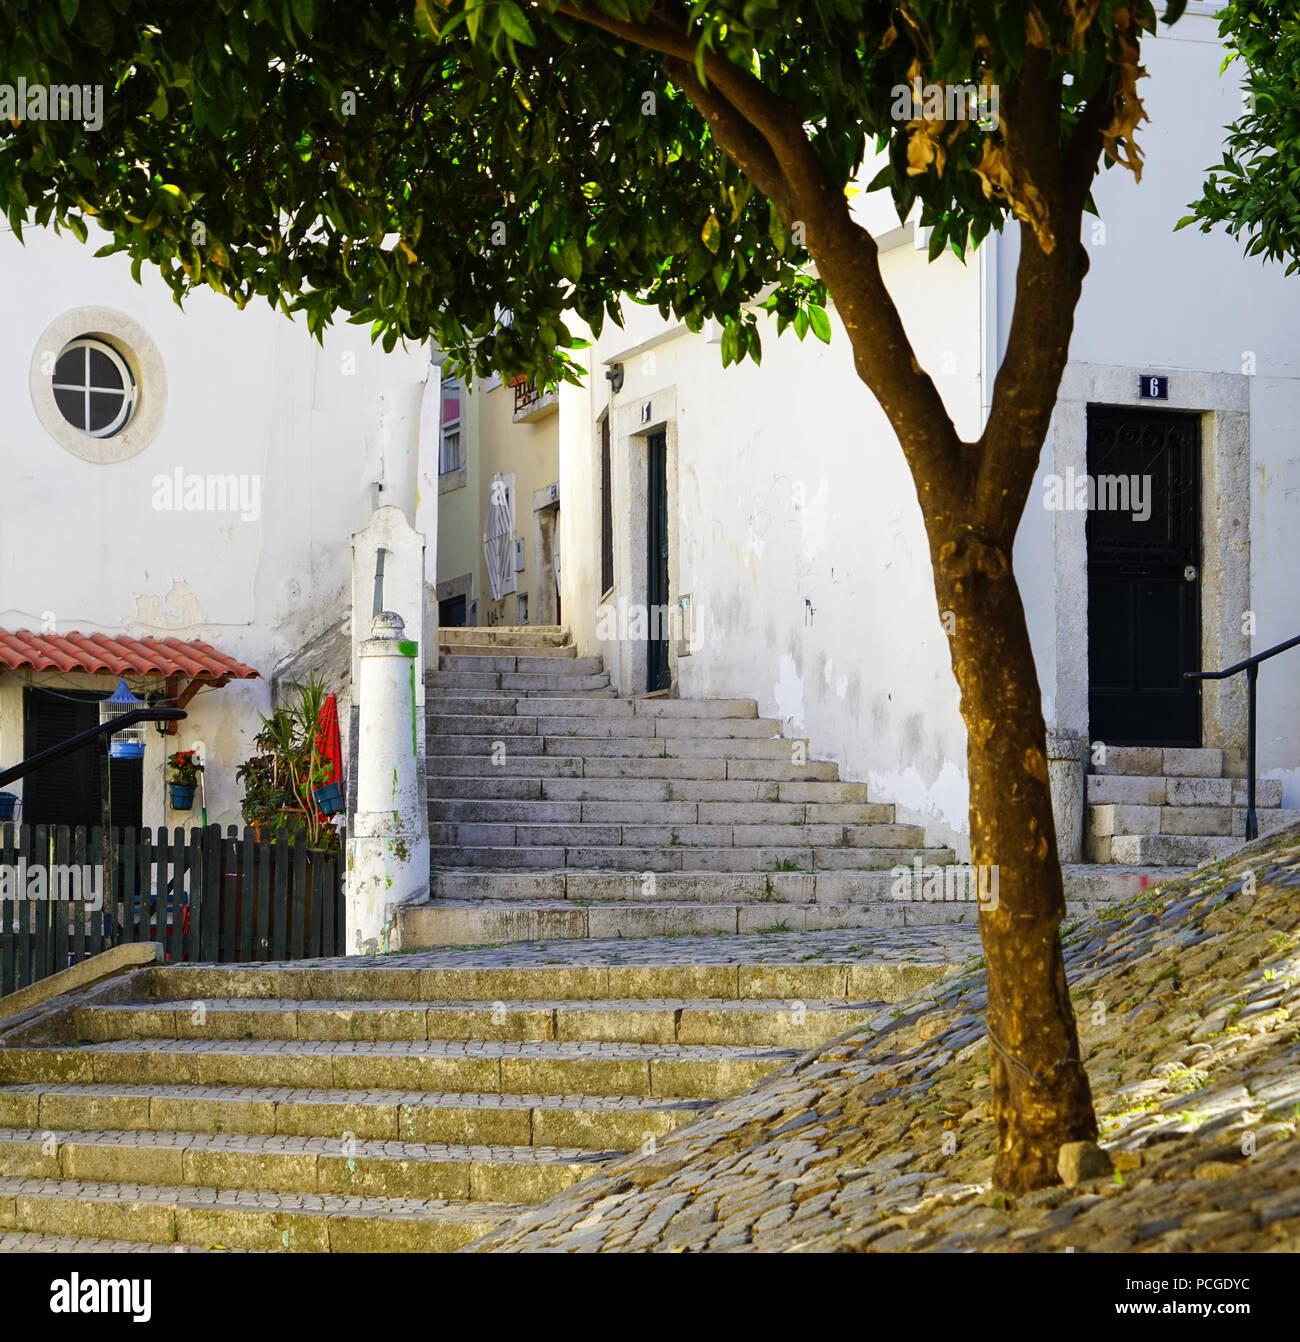 Lisboa. Escalera en Alfama. Imagen De Stock